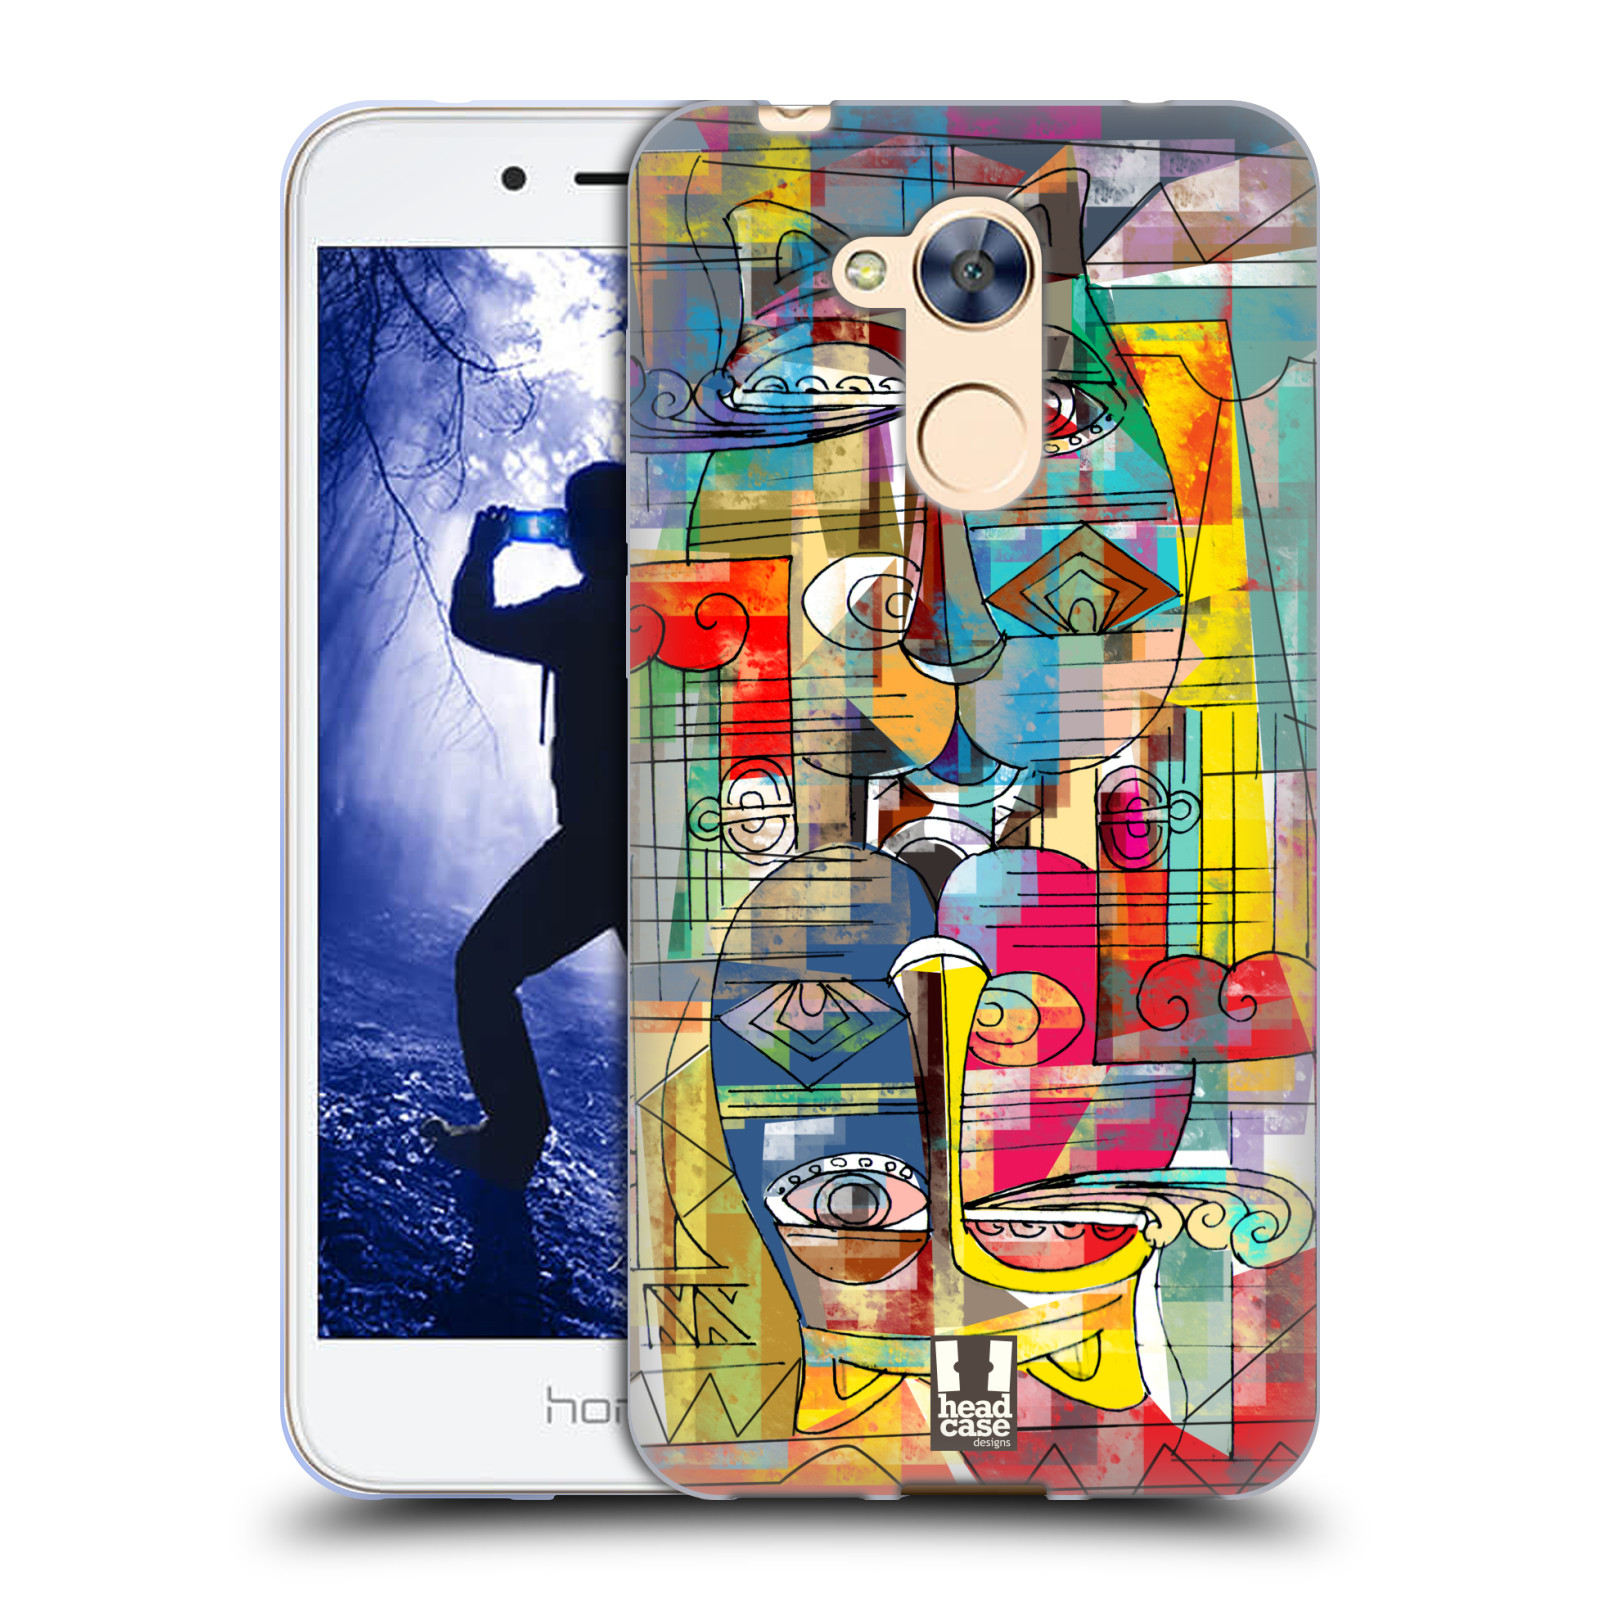 Silikonové pouzdro na mobil Honor 6A - Head Case - AZTEC MANX